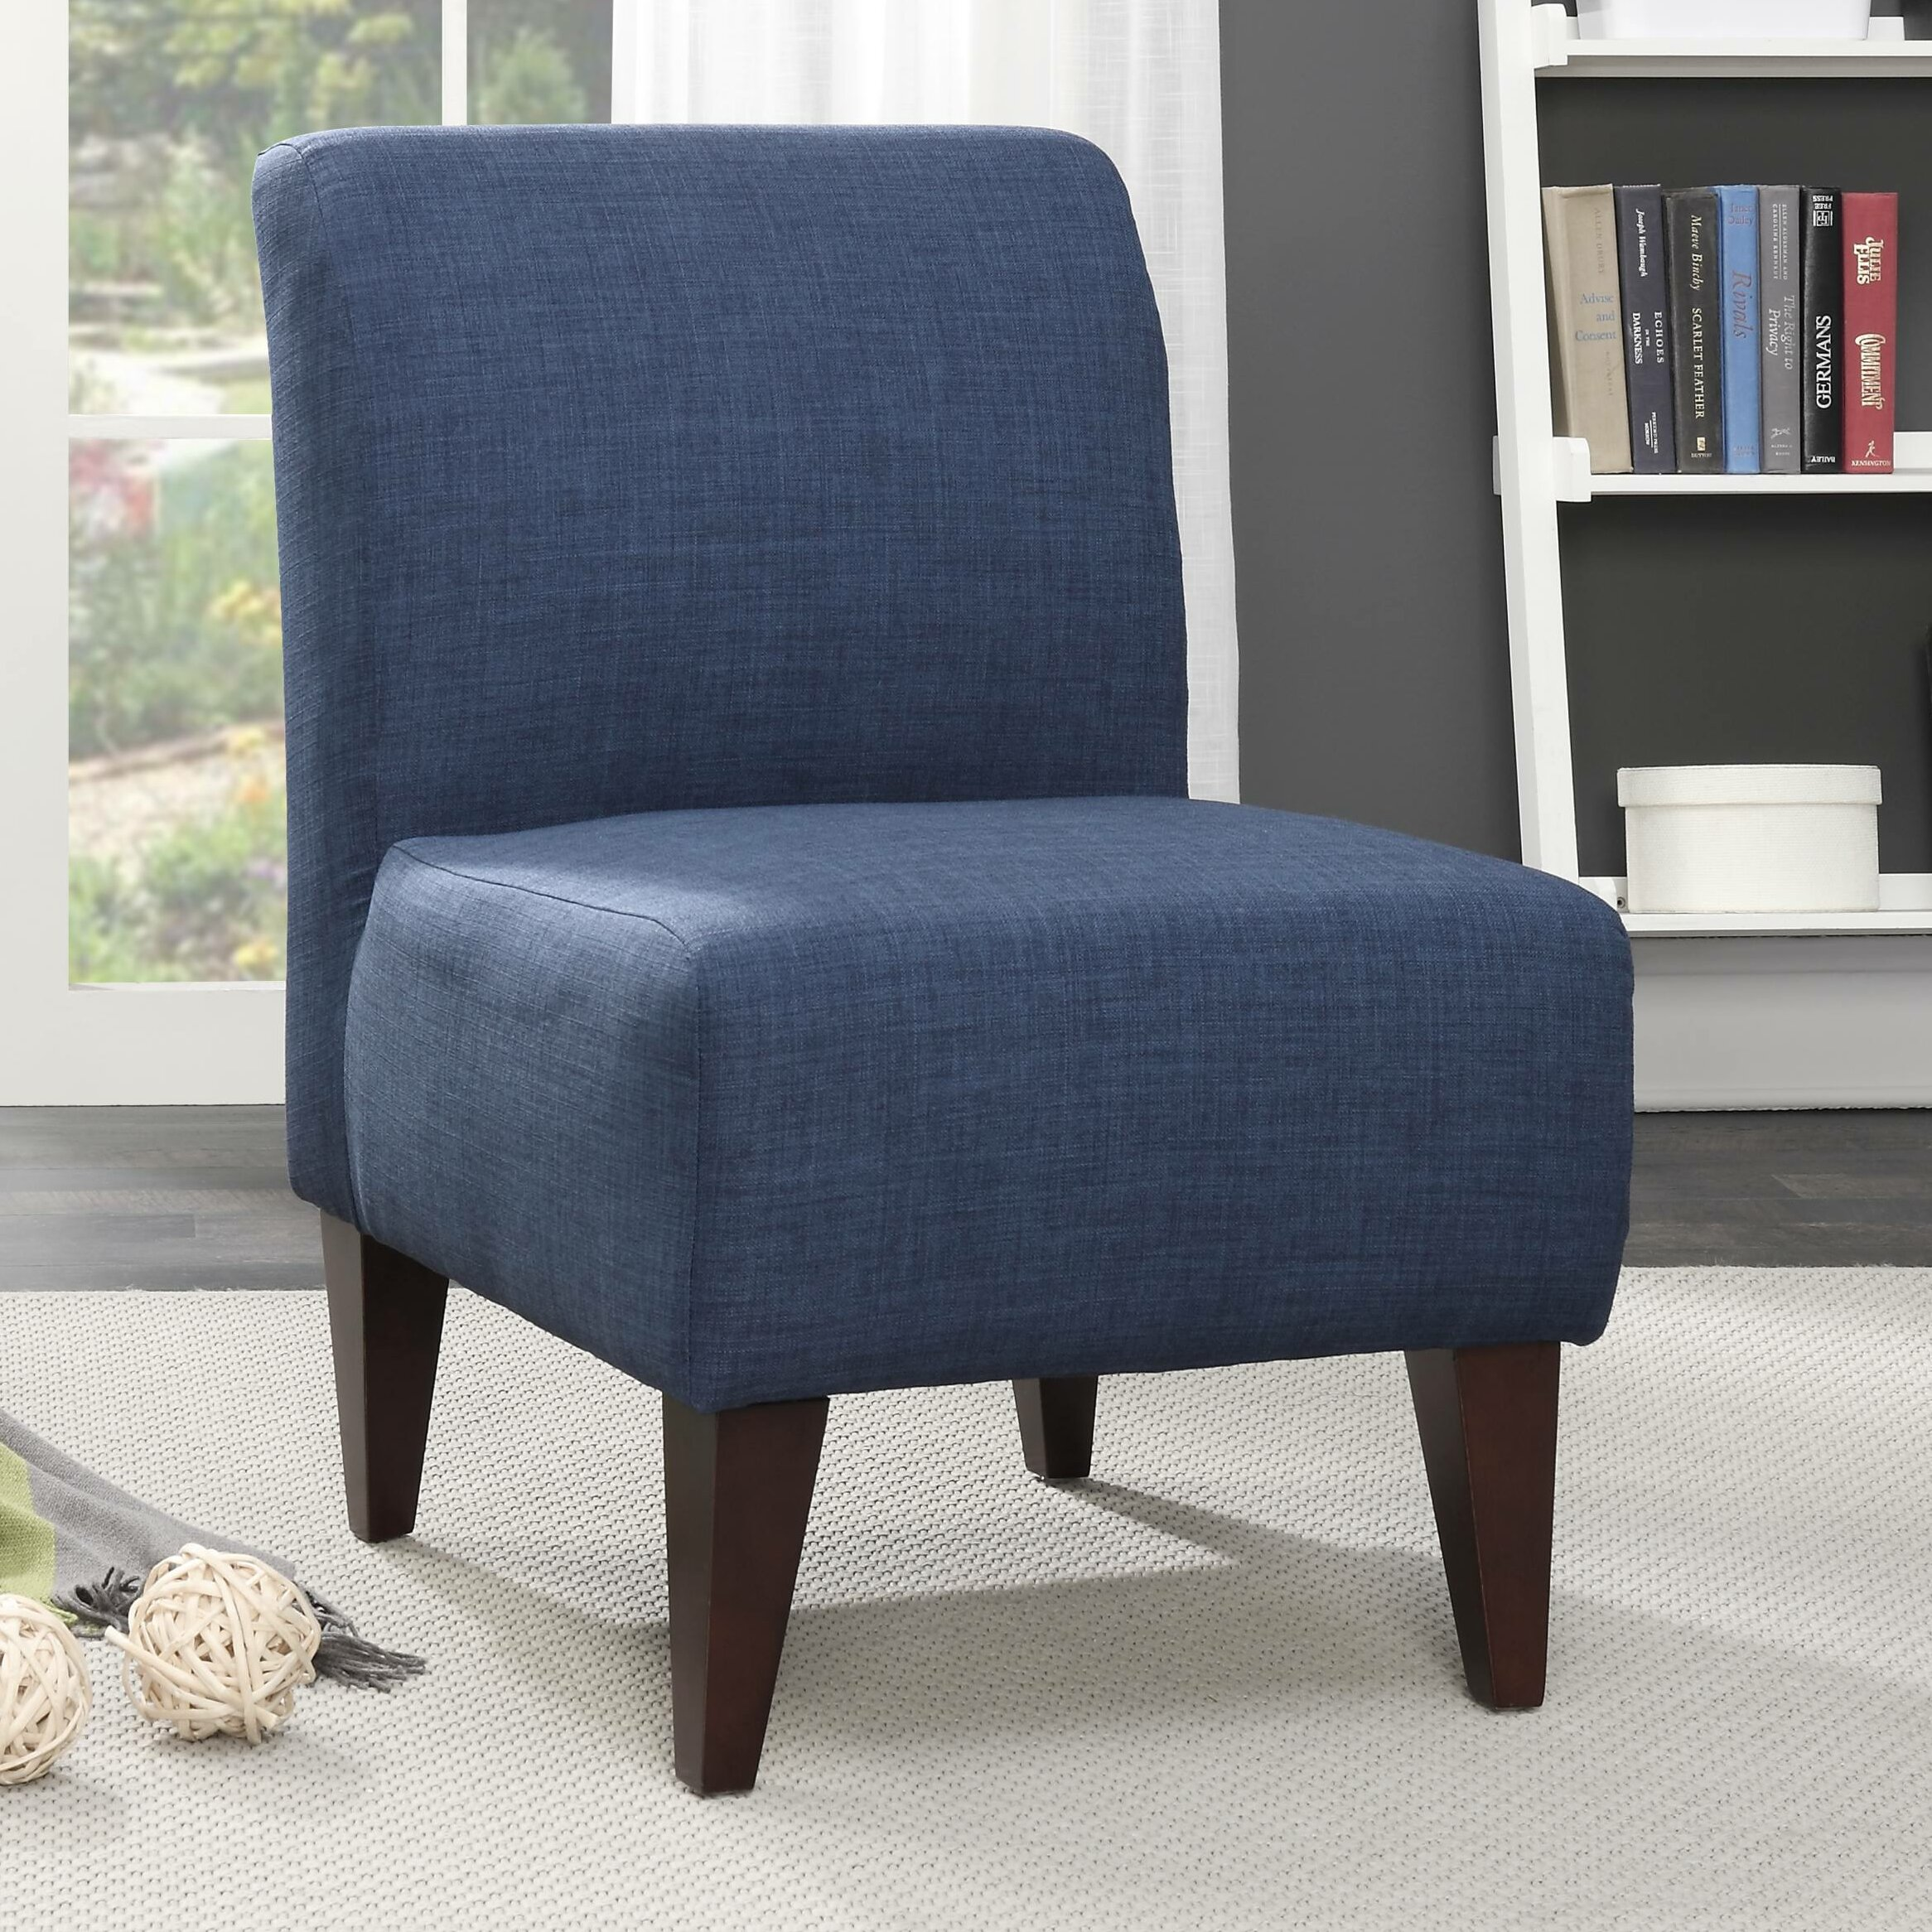 Varick gallery proctor slipper chair reviews wayfair for Slipper chair